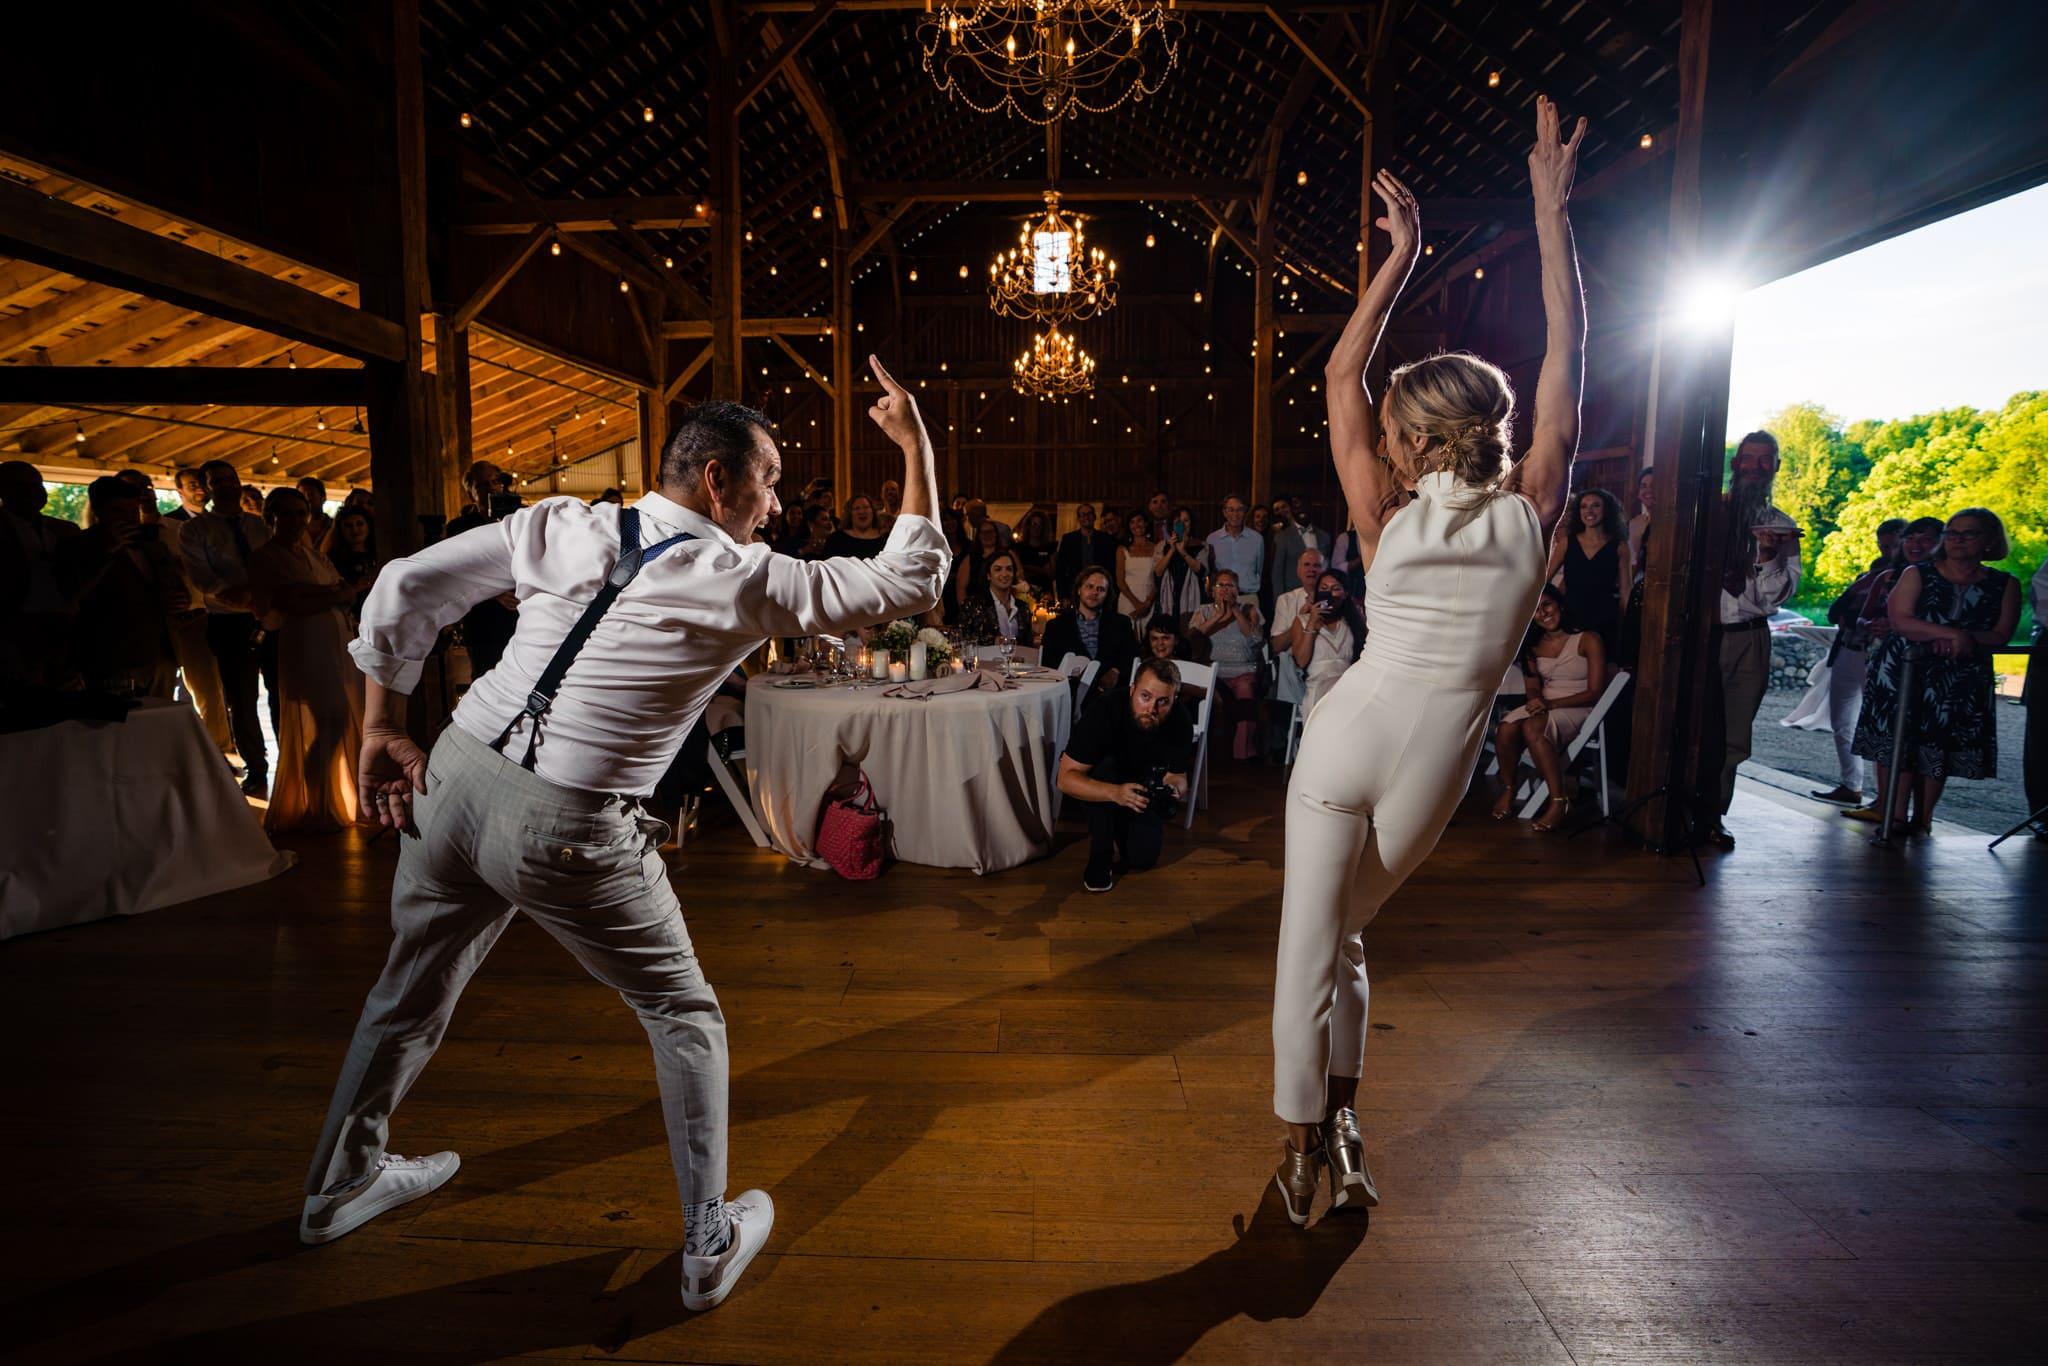 Wedding Venues in Michigan - Hidden Vineyard Wedding Barn